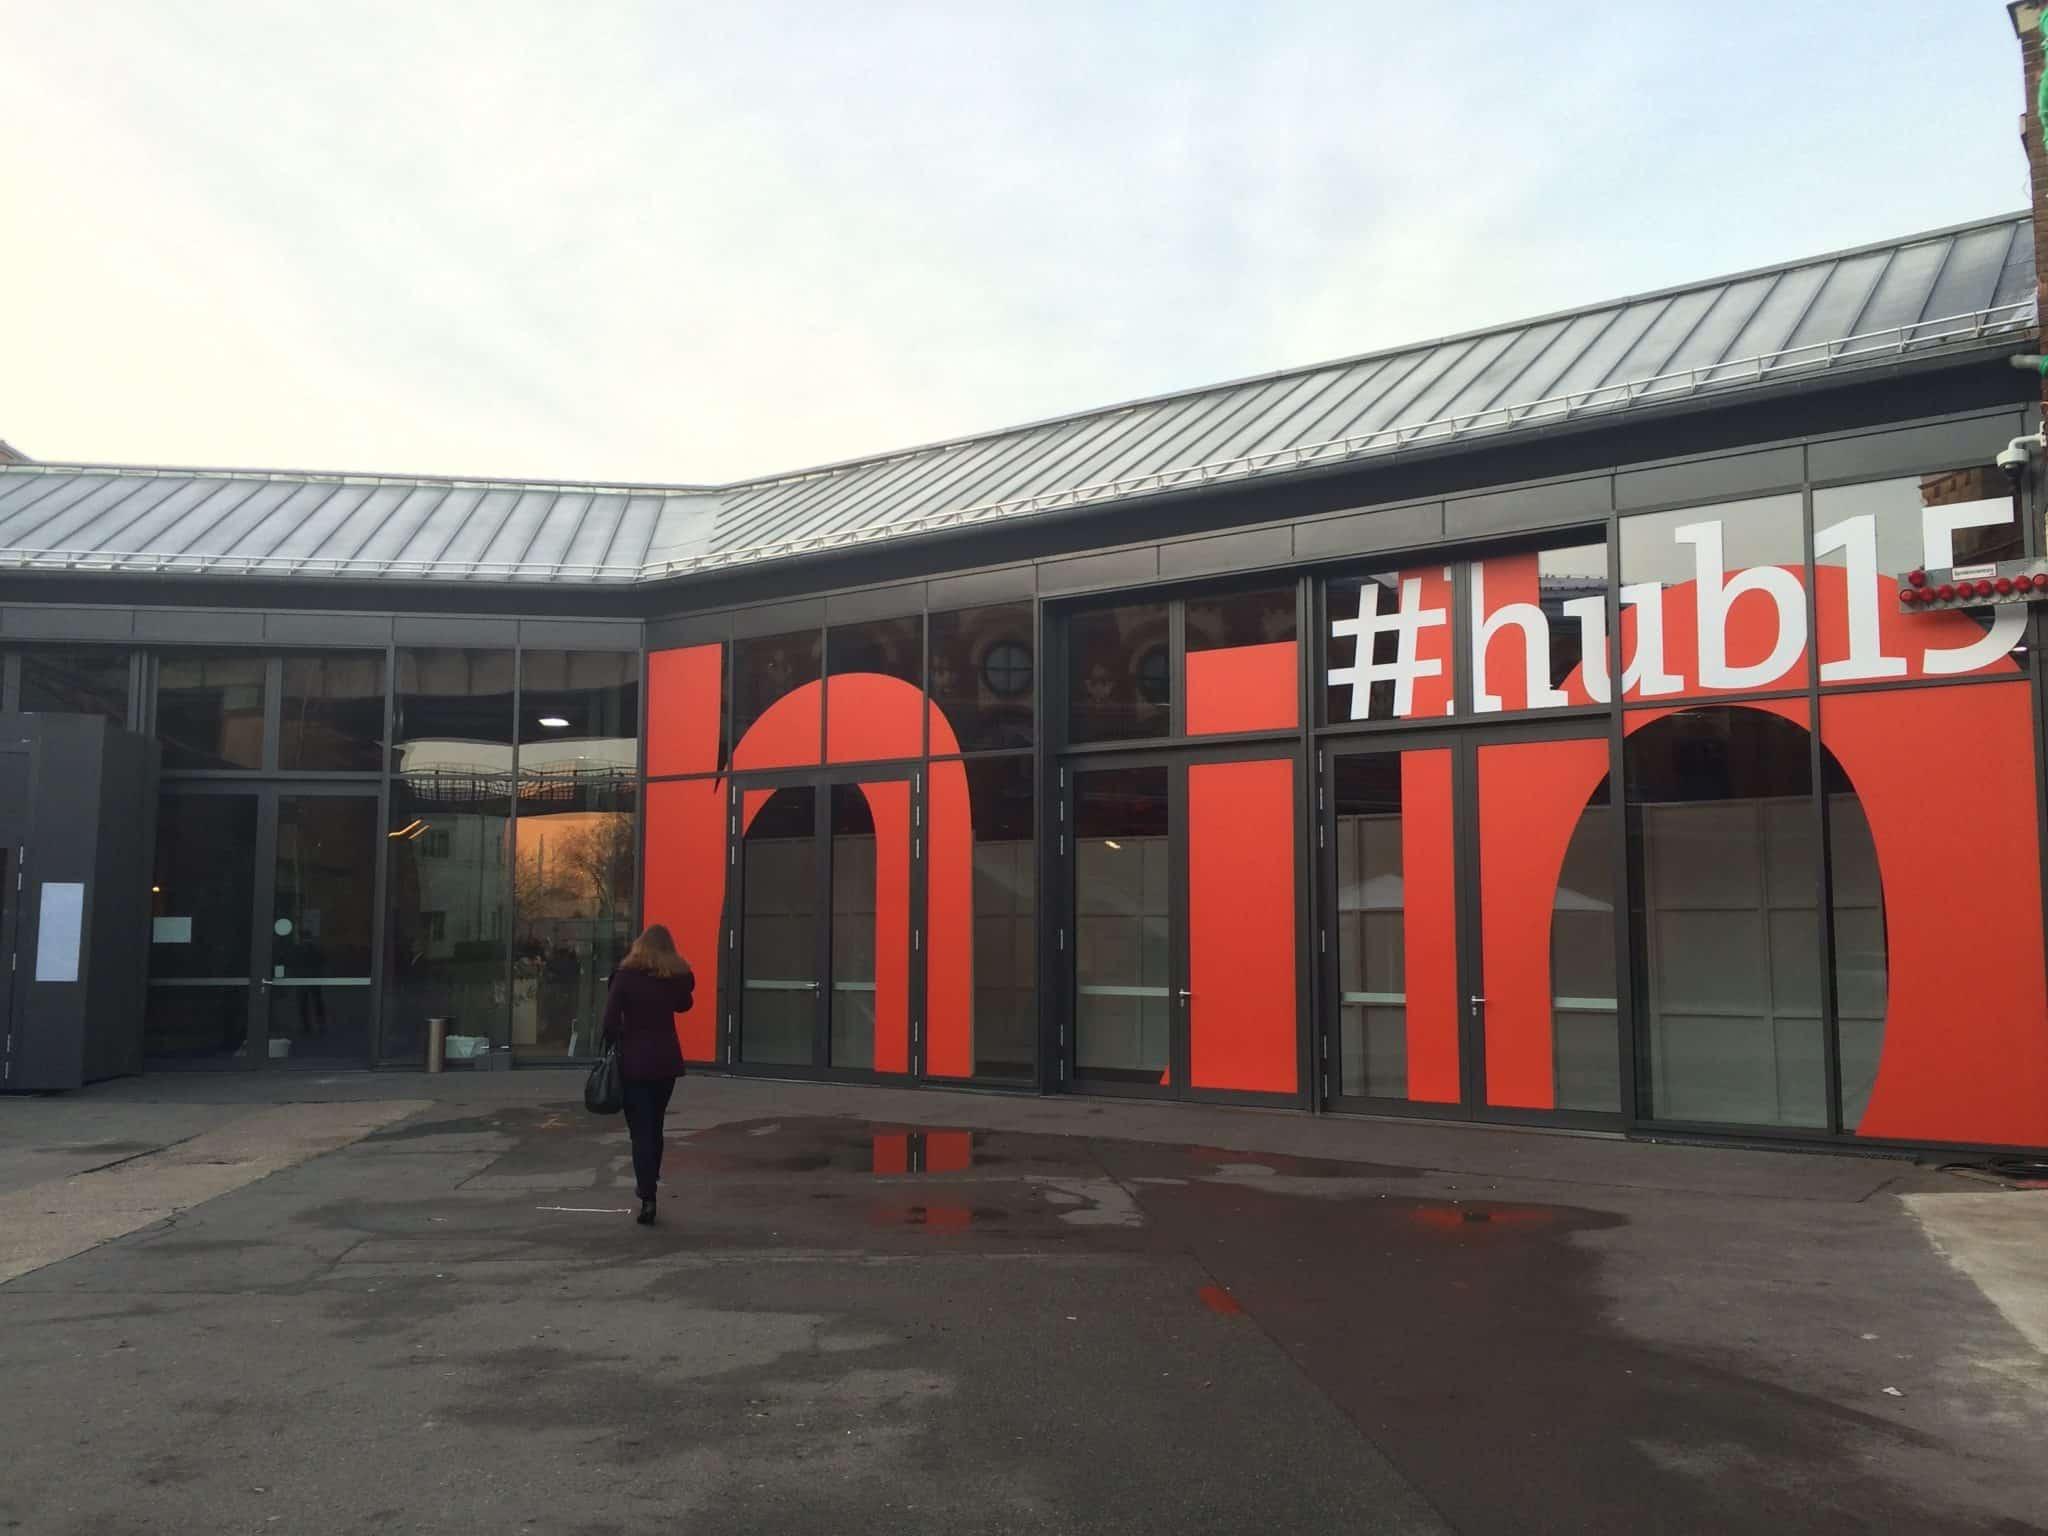 Eingangsbereich hub conference in Berlin am 10.12.2015